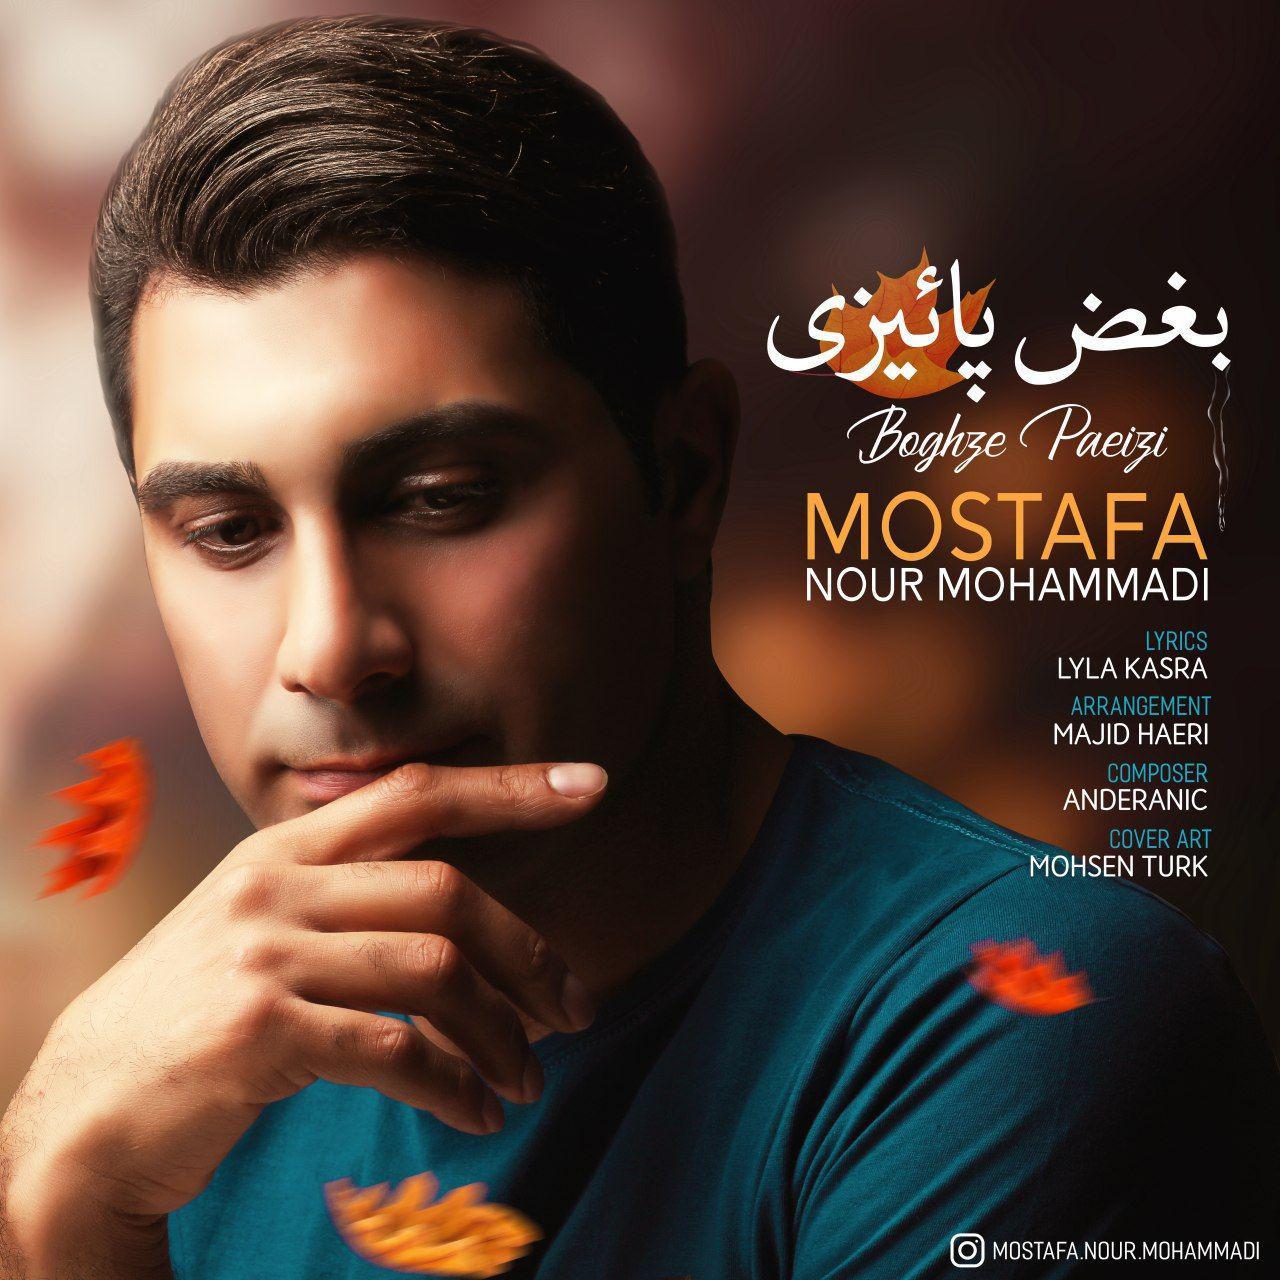 http://dl.rasanejavan.com/rasane/1397/mehr97/10/Mostafa%20Nour%20Mohammadi%20-%20Boghze%20Paeizi.jpg